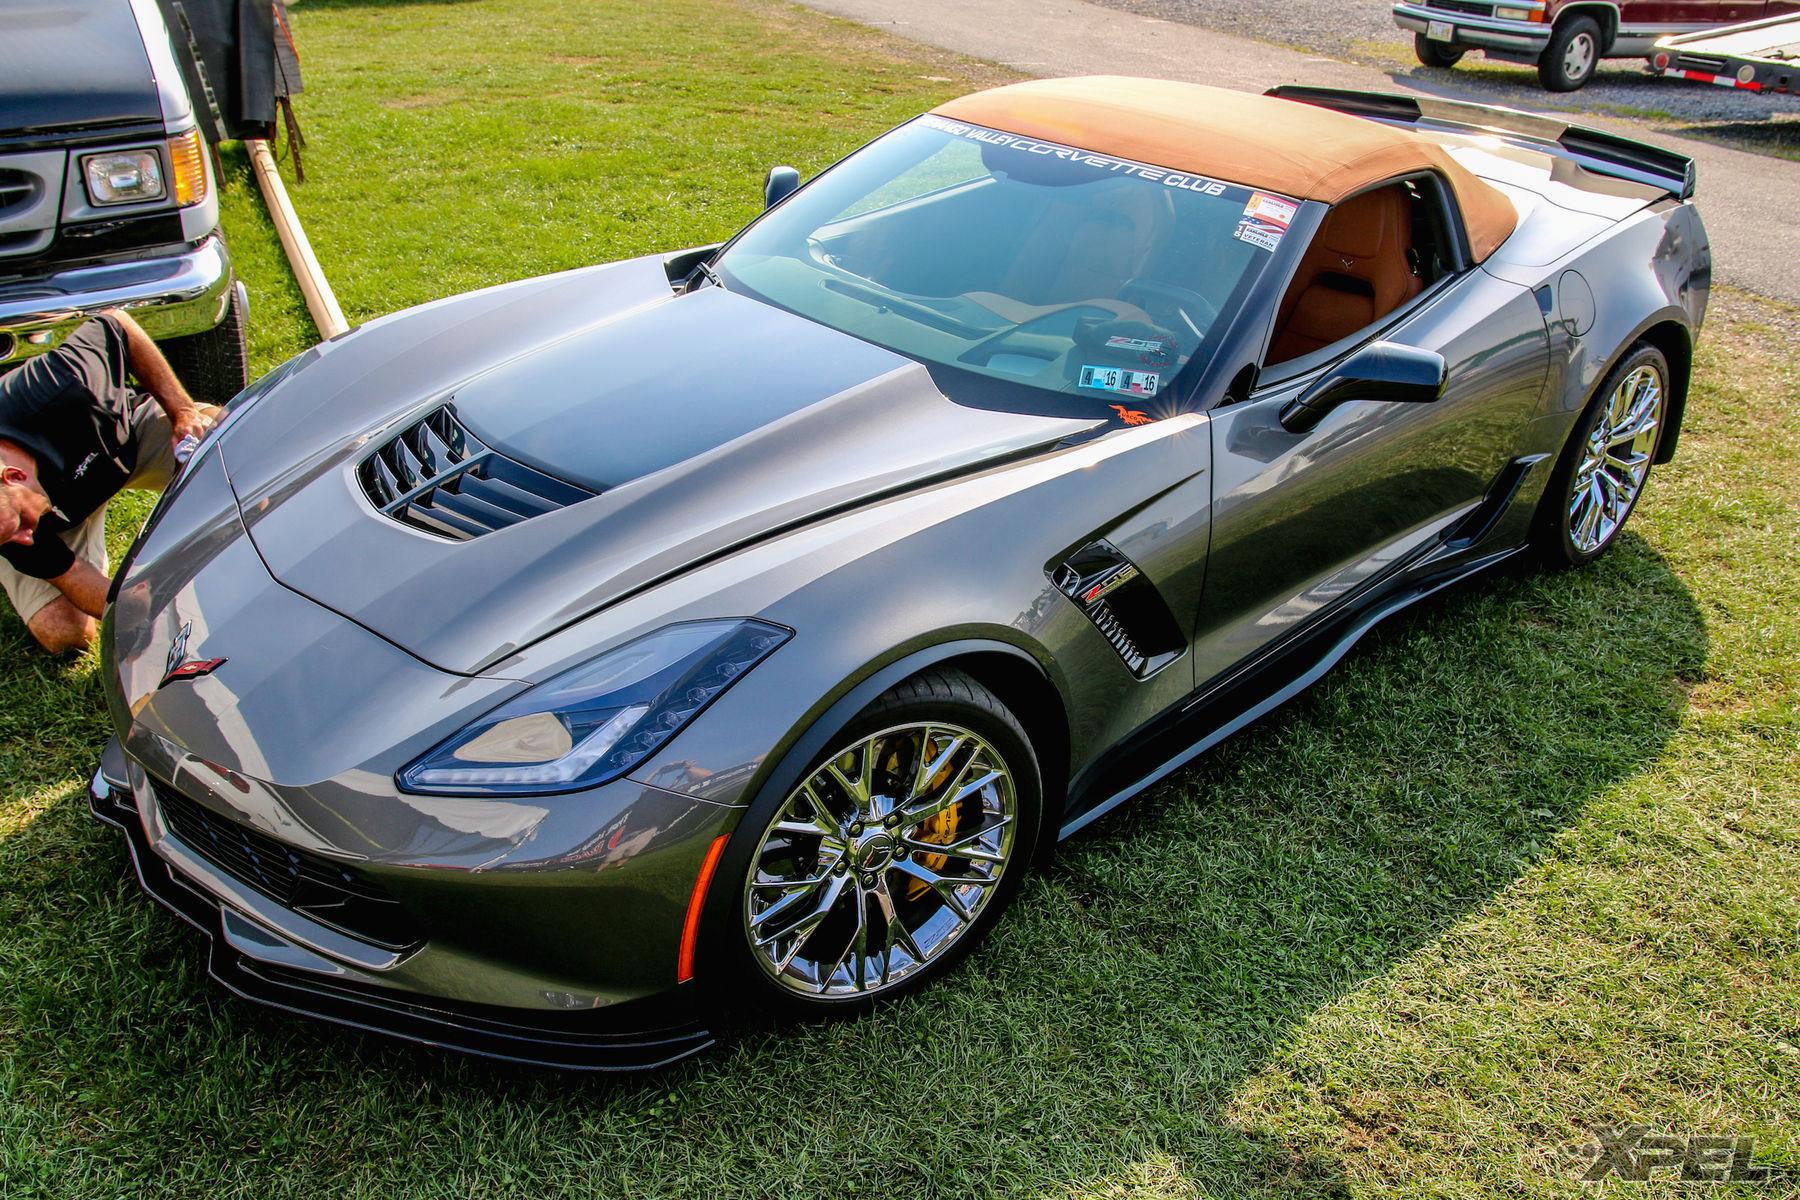 2016 Chevrolet Corvette Z06 | Chevy Corvette at Corvettes at Carlisle 2015